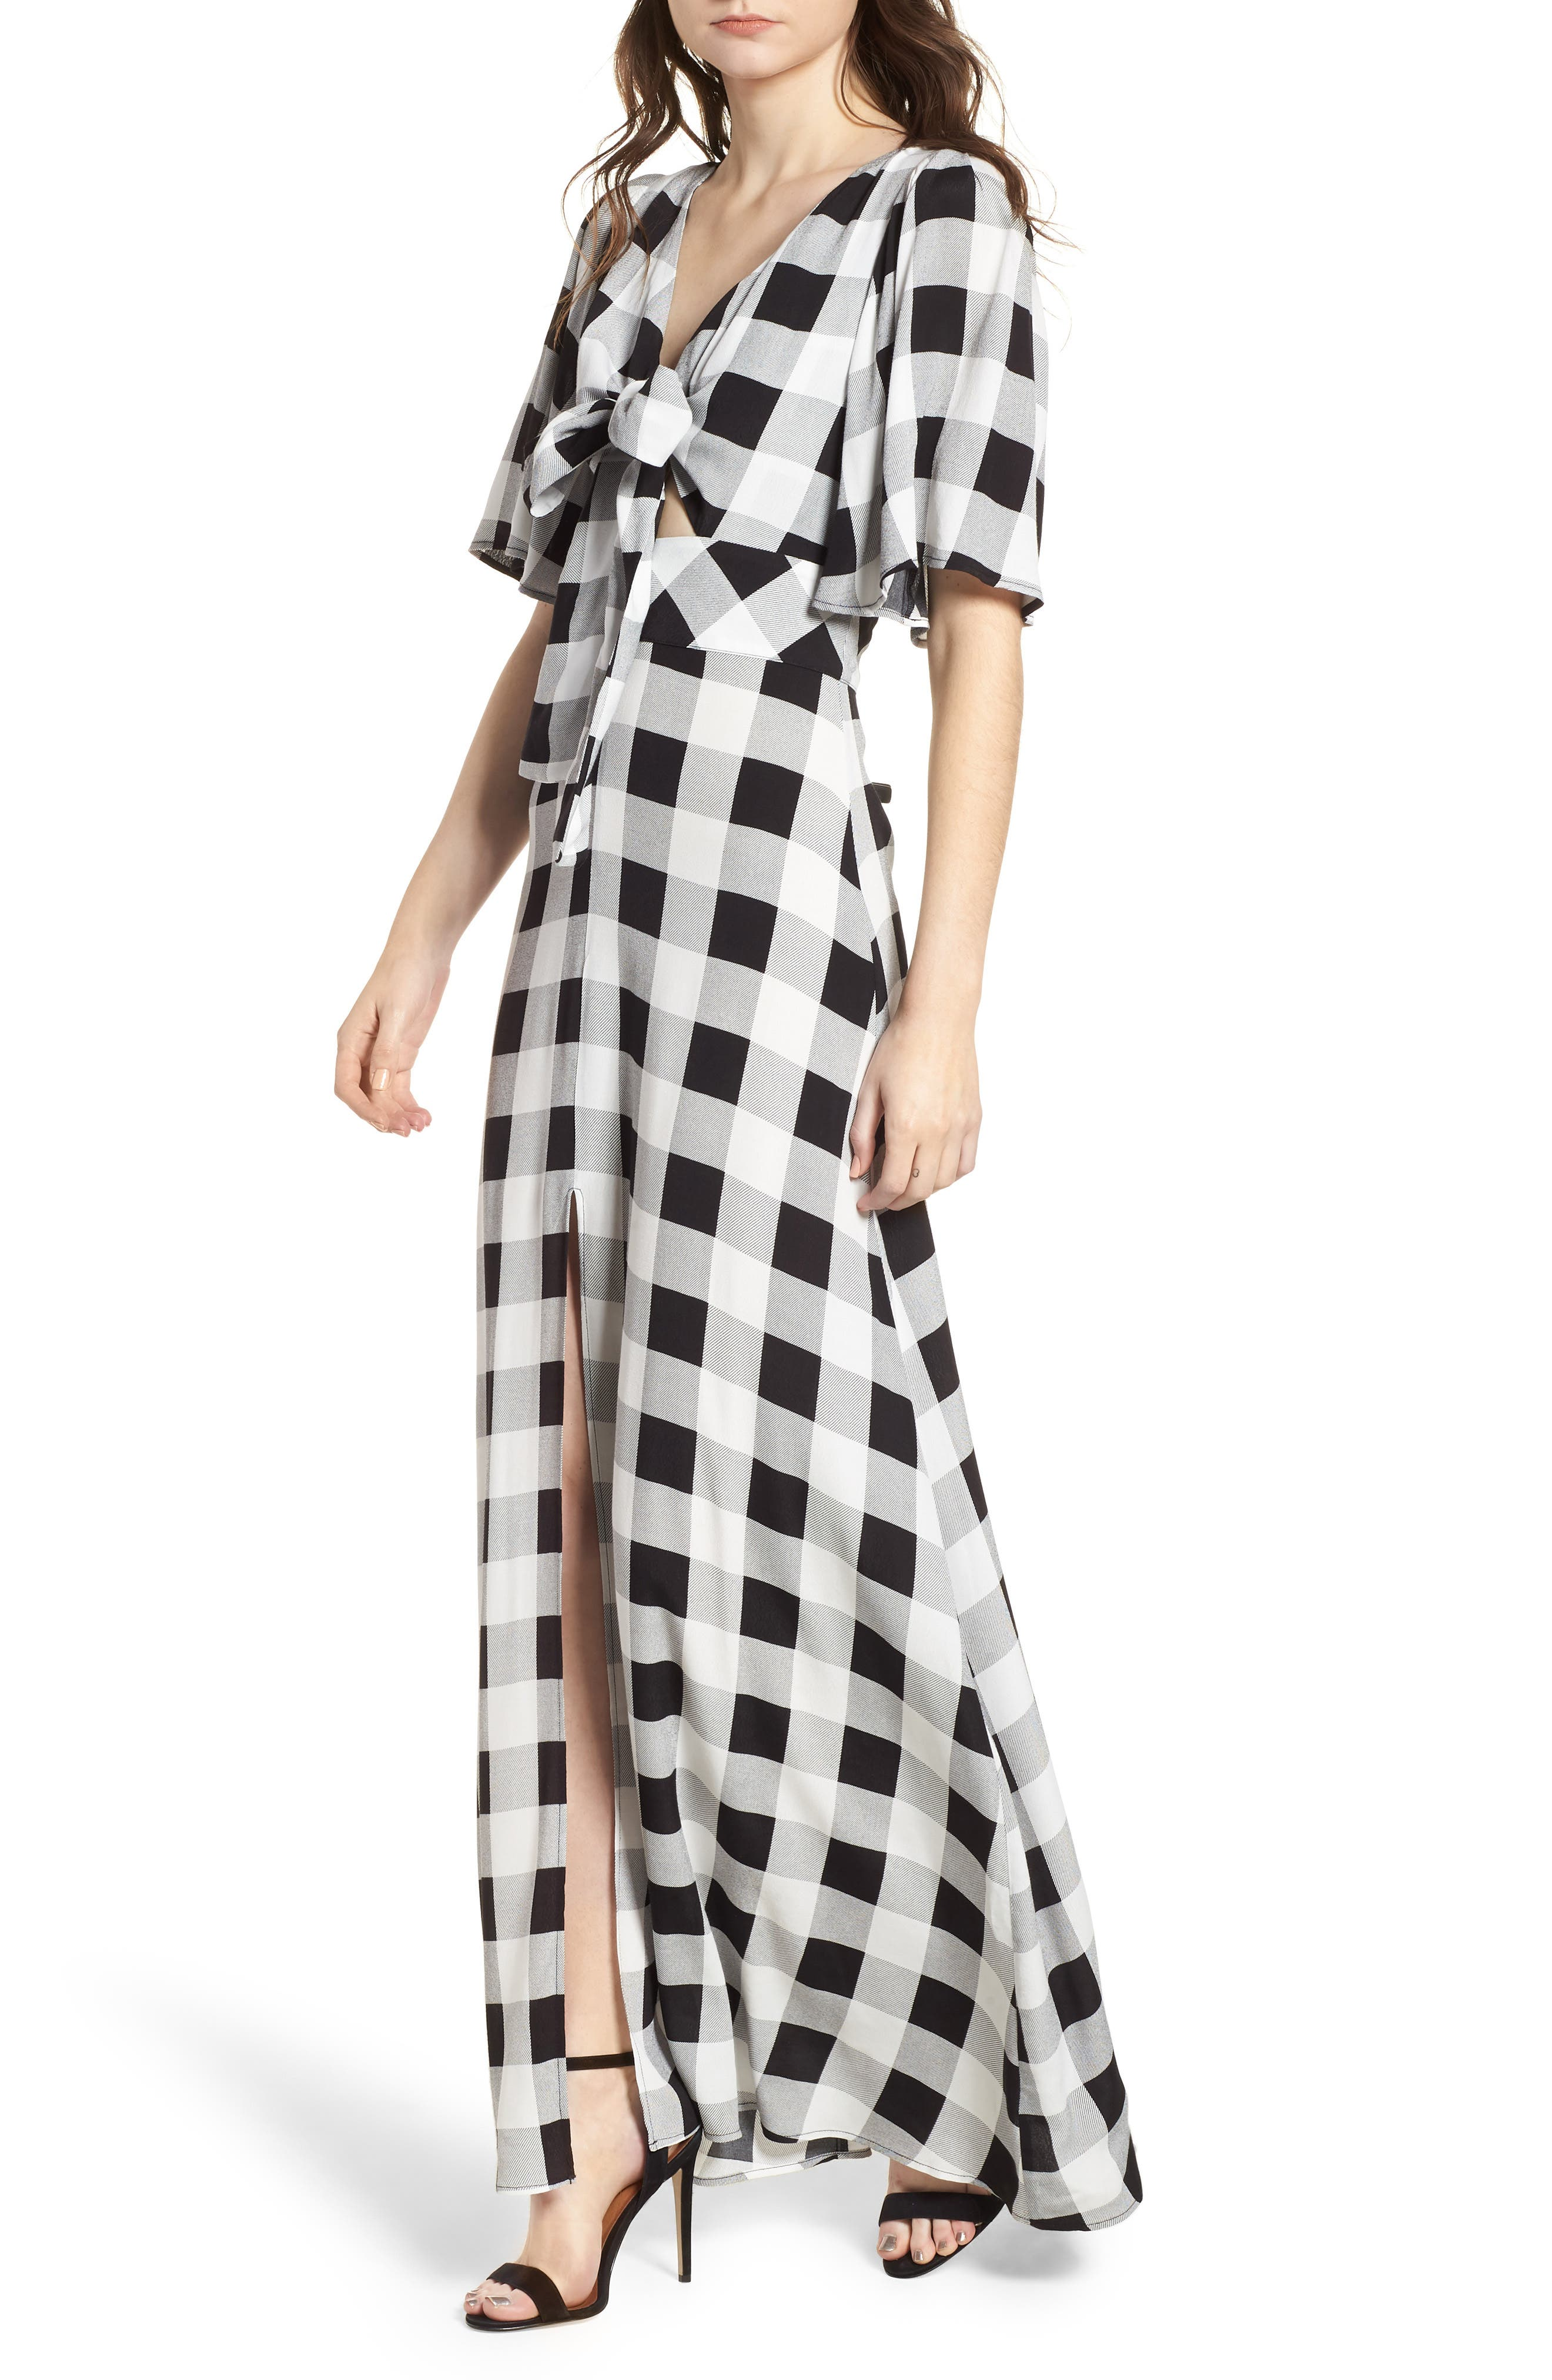 Ramon Tie Front Maxi Dress,                             Main thumbnail 1, color,                             Noir Blanc Gingham